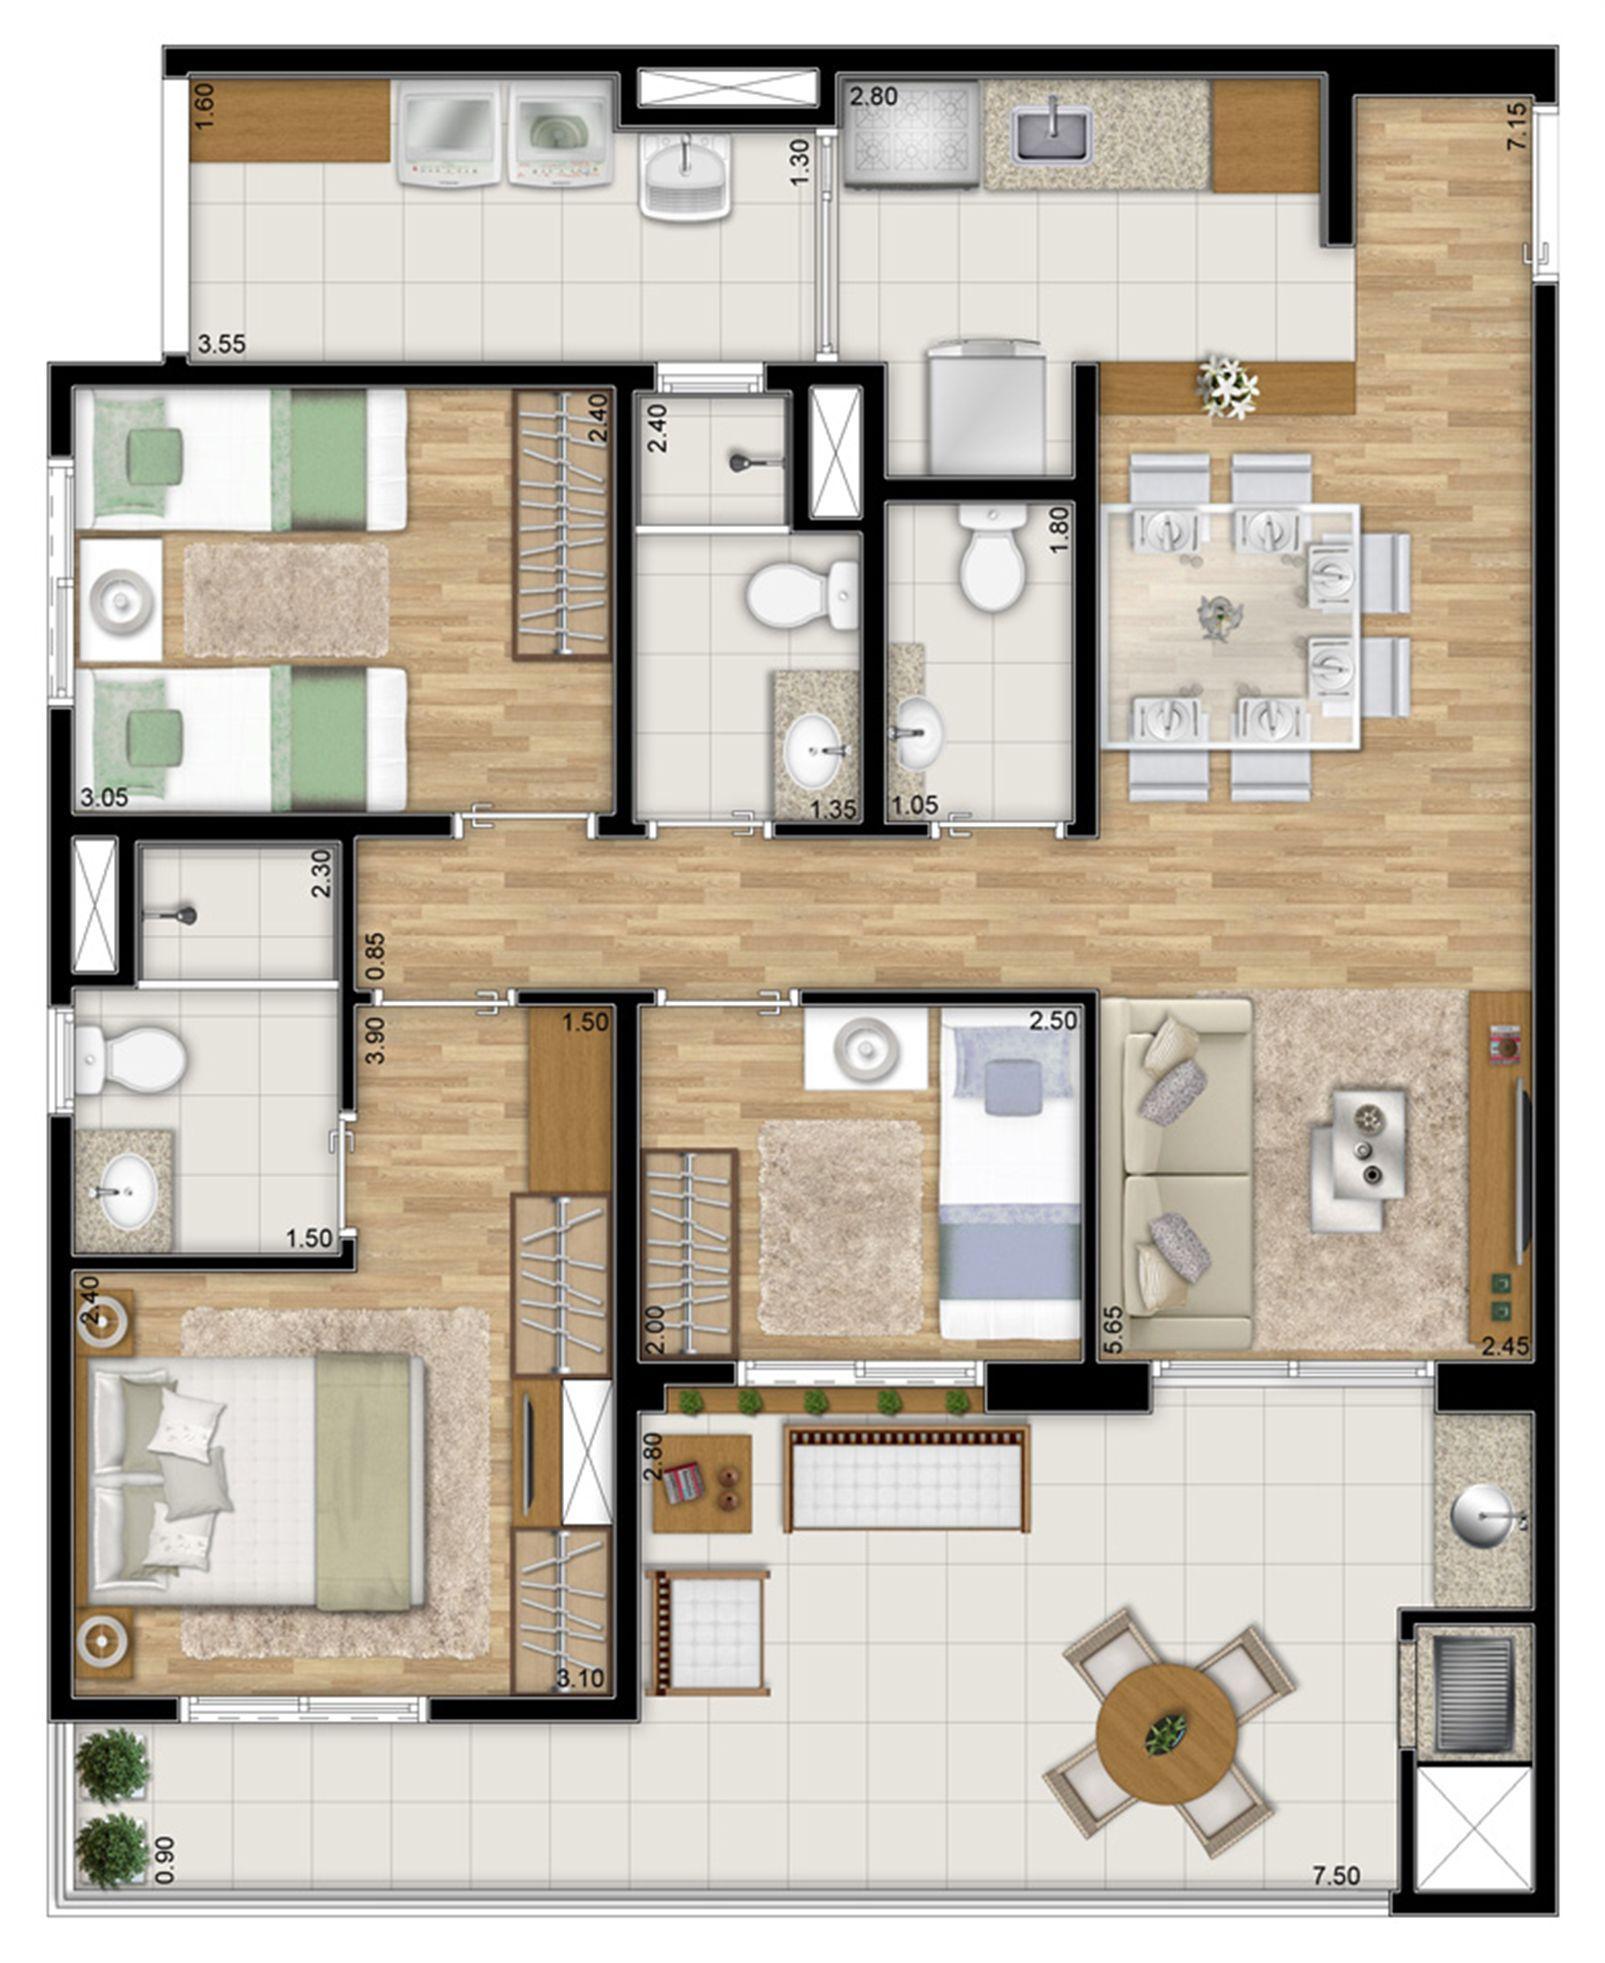 Planta tipo do apartamento de 87 m² privativos - 3 dorms. c 1 suíte | Varanda Ipiranga – Apartamentono  Ipiranga - São Paulo - São Paulo